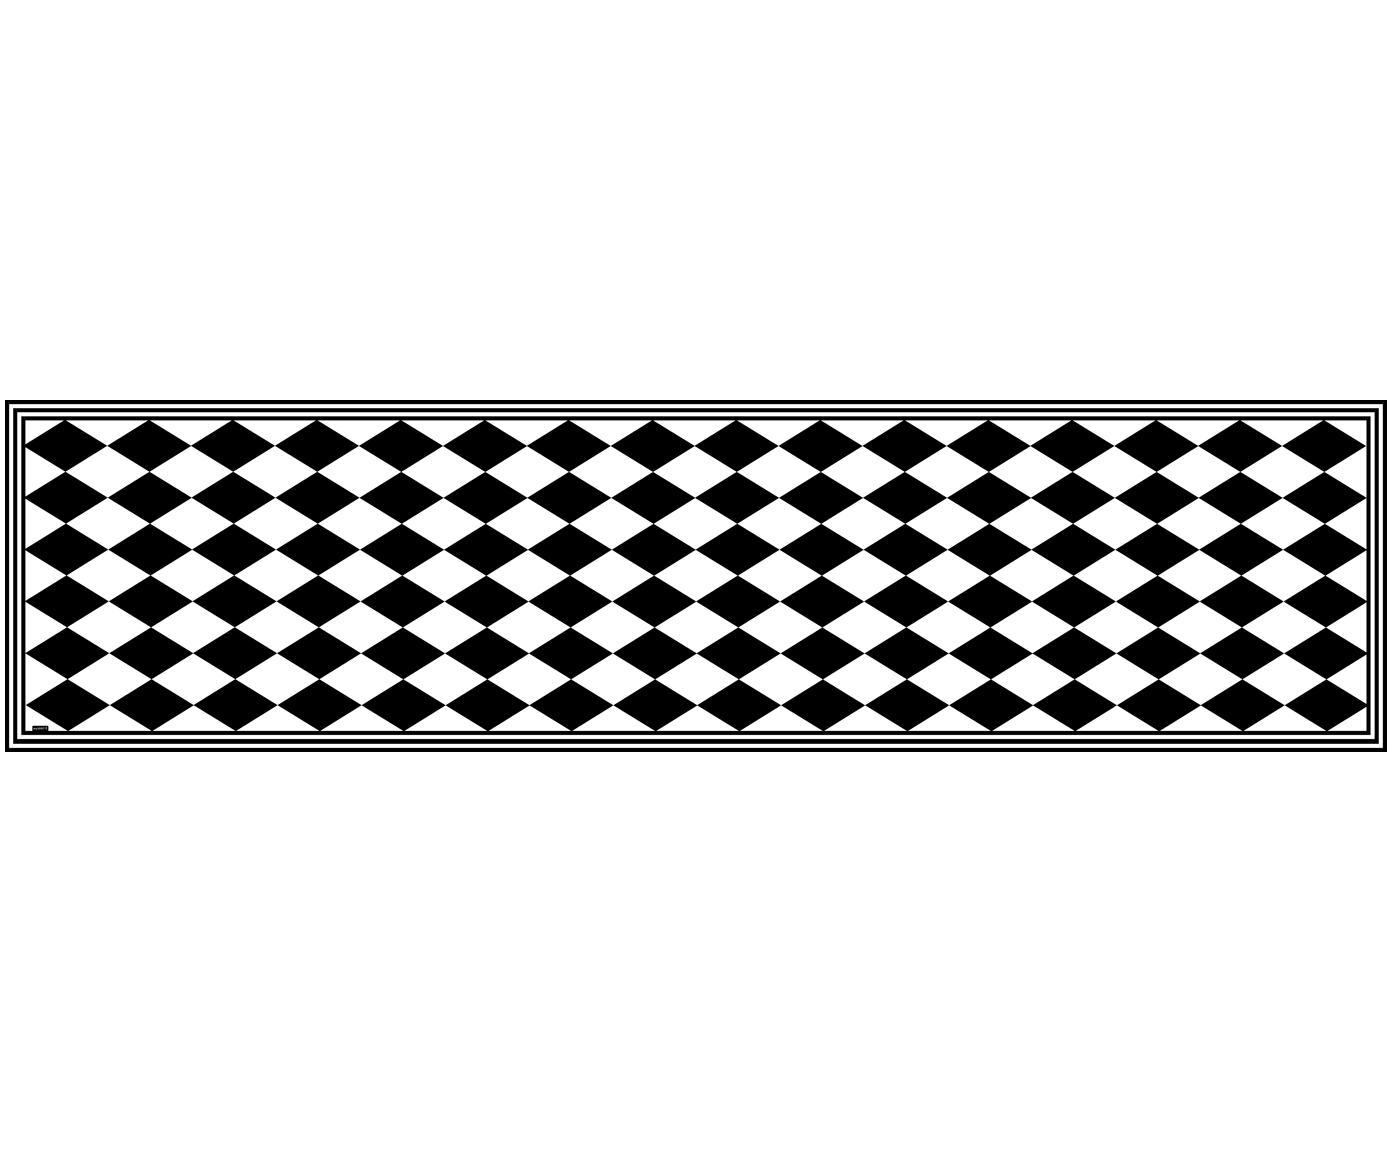 Alfombra vinílica Bobby II, Vinilo, reciclable, Negro, blanco, An 65 x L 255 cm